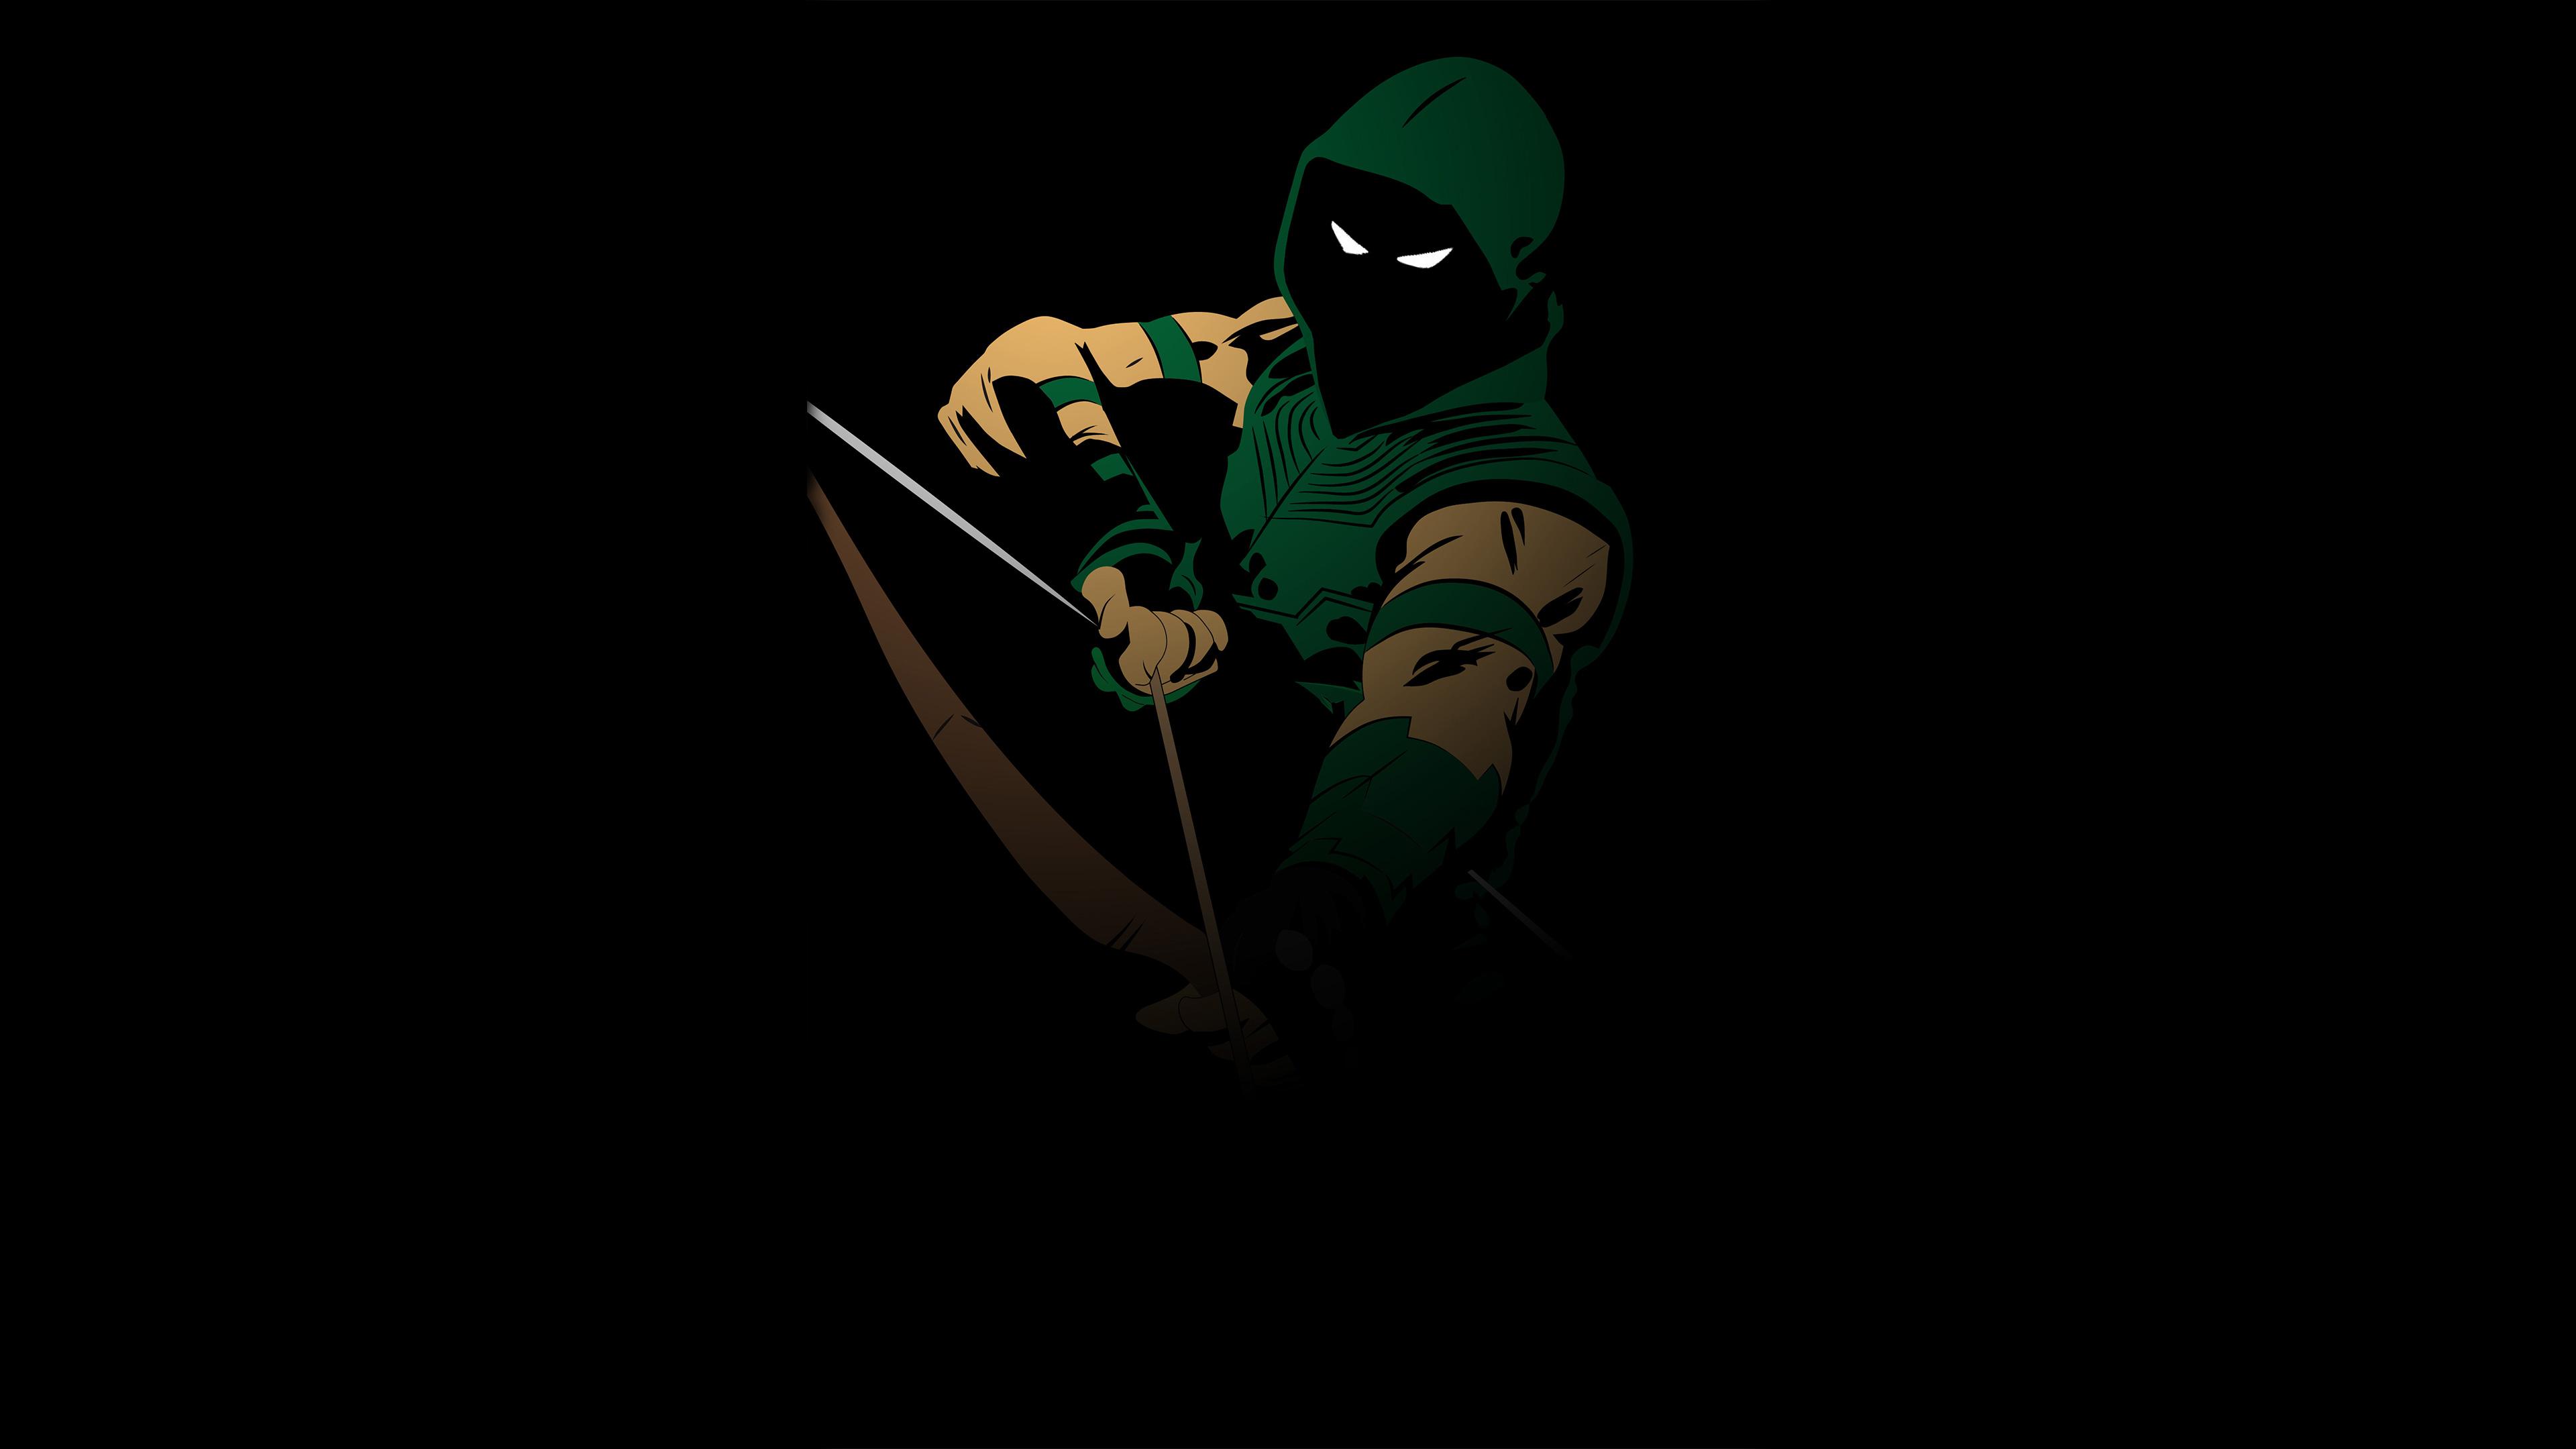 Green Arrow Minimal 4k Hd Superheroes 4k Wallpapers